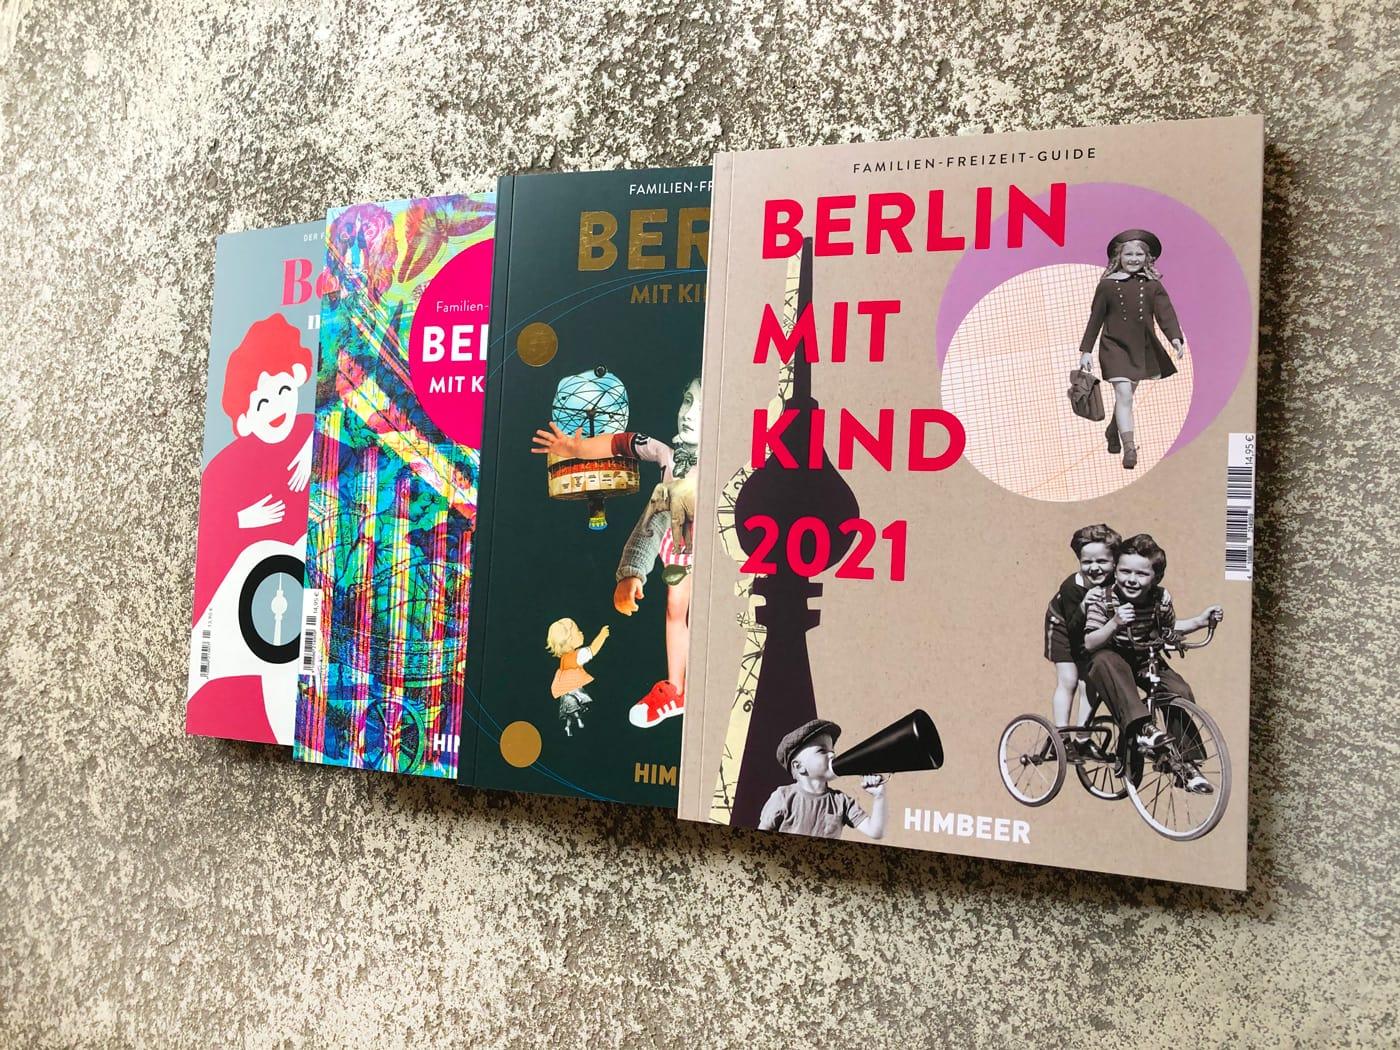 Familien-Freizeit-Guides // HIMBEER